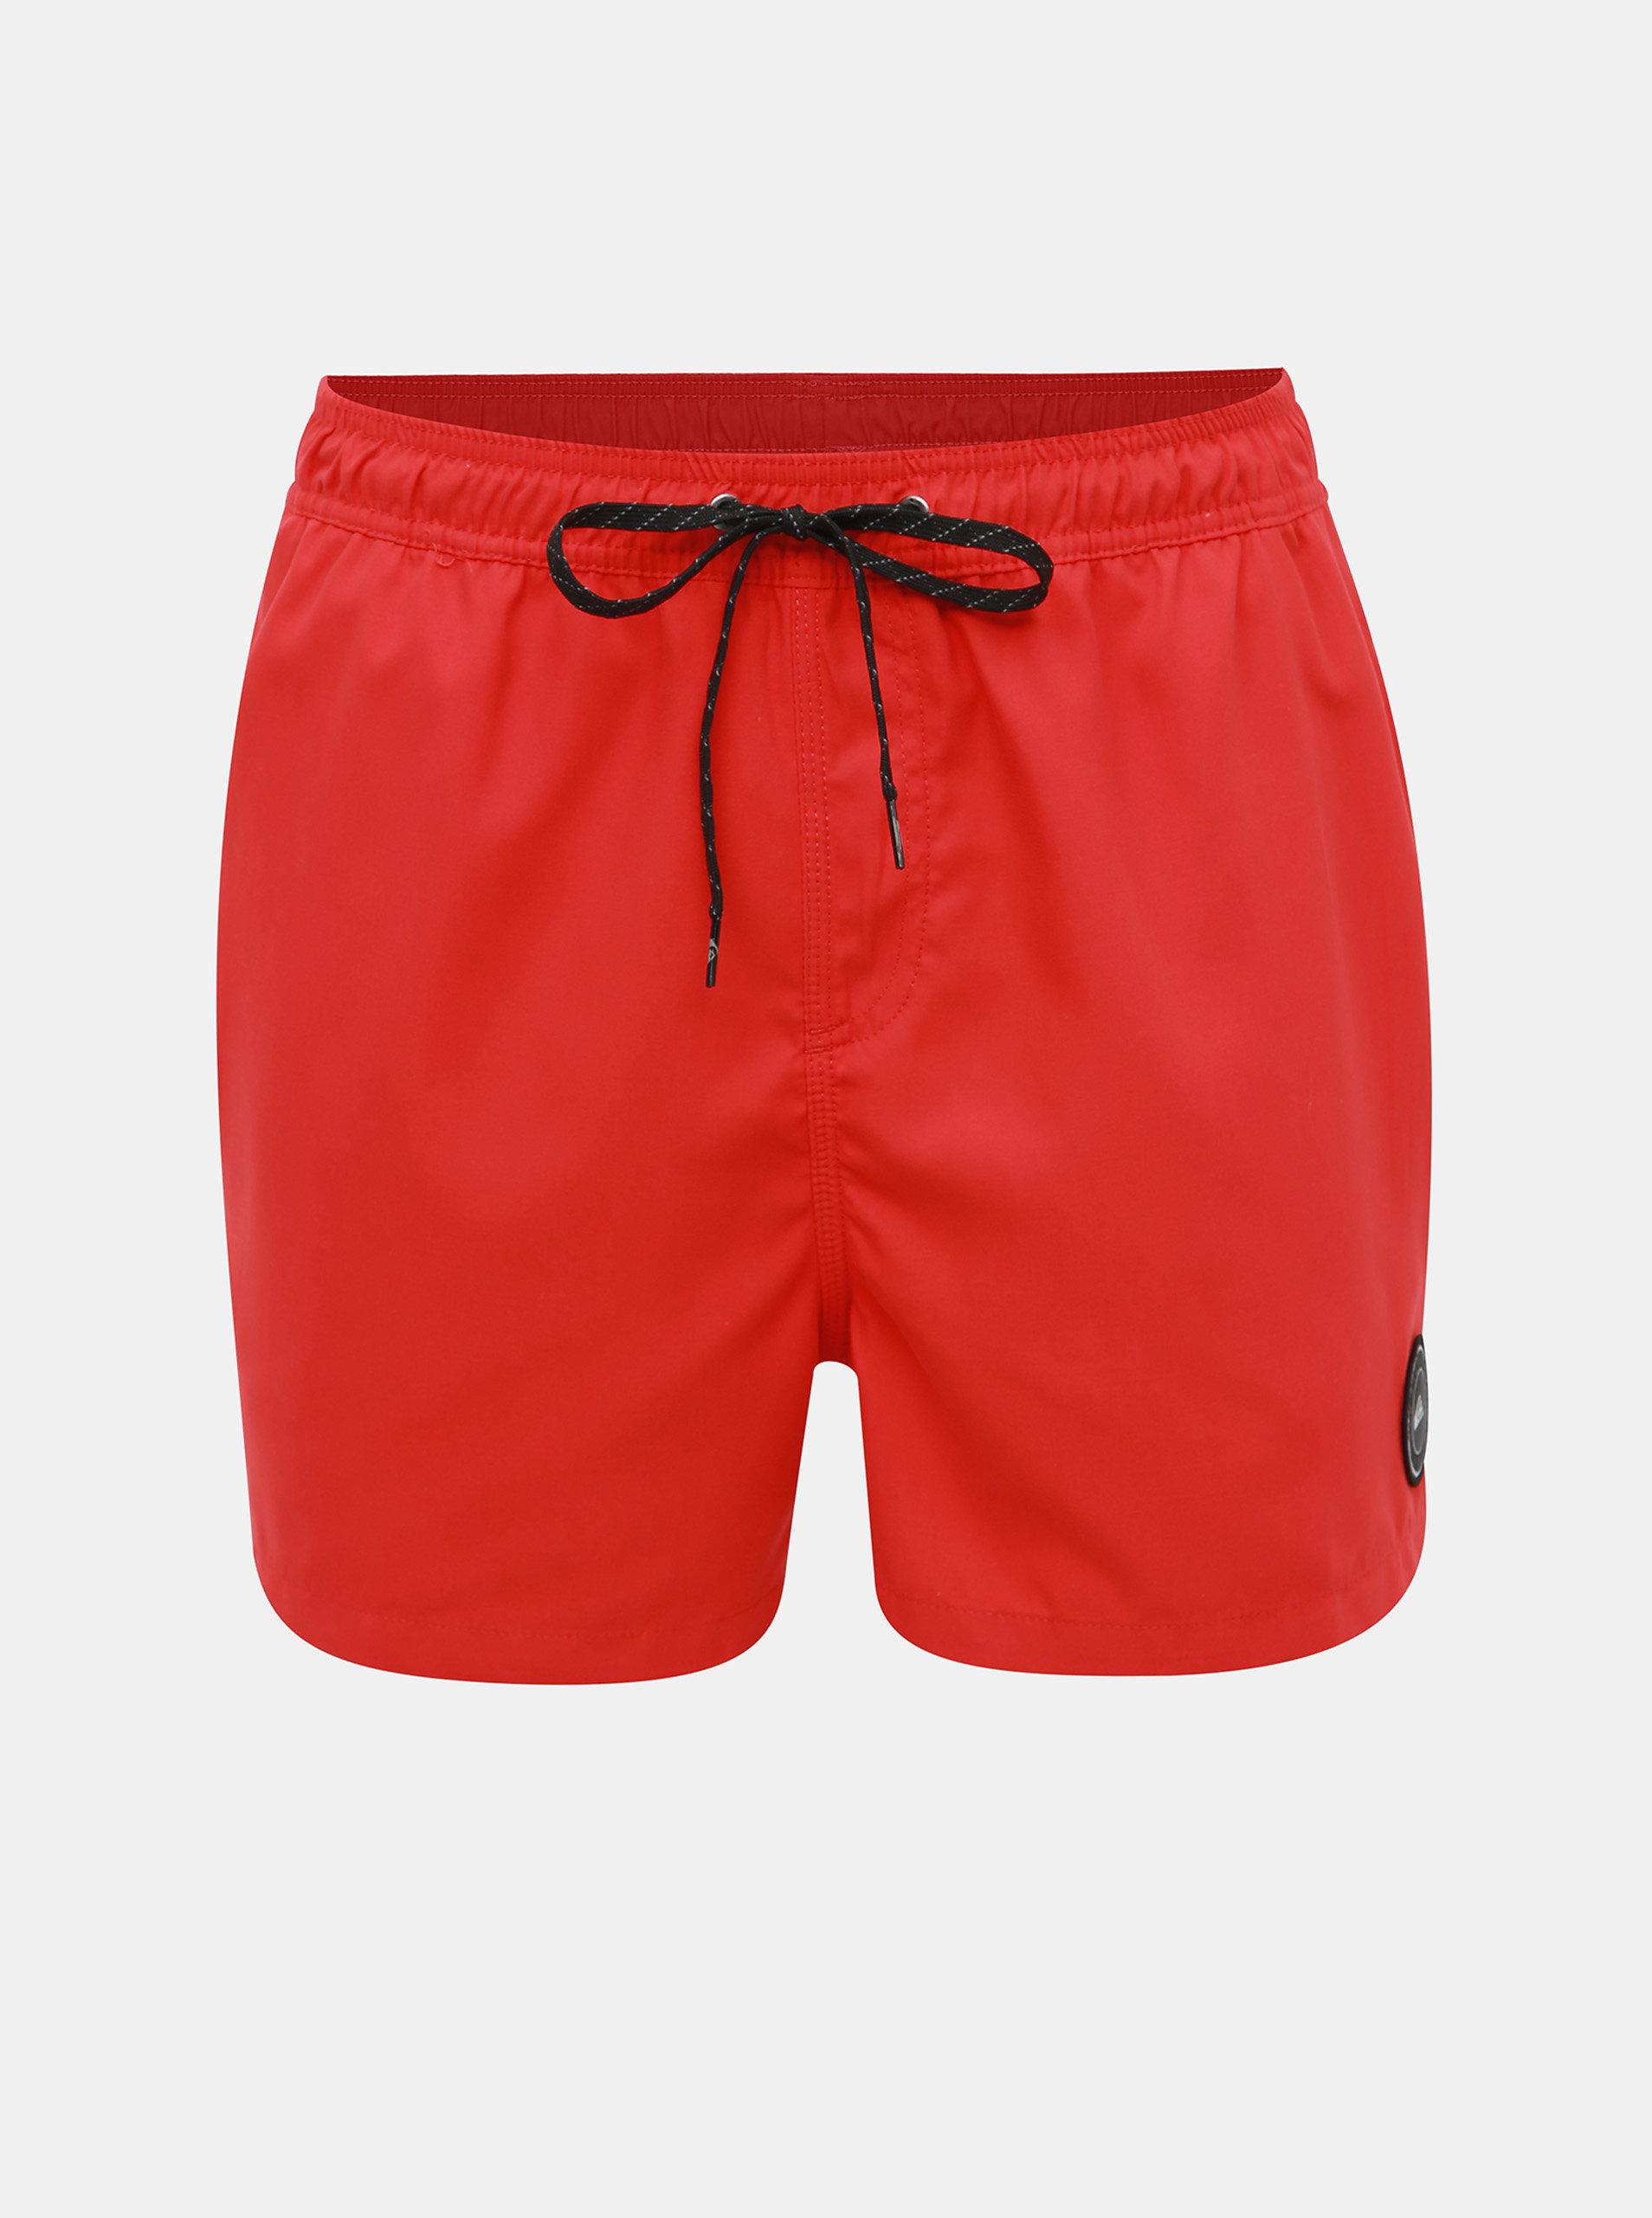 59119a1c5c Červené plavky Quiksilver ...